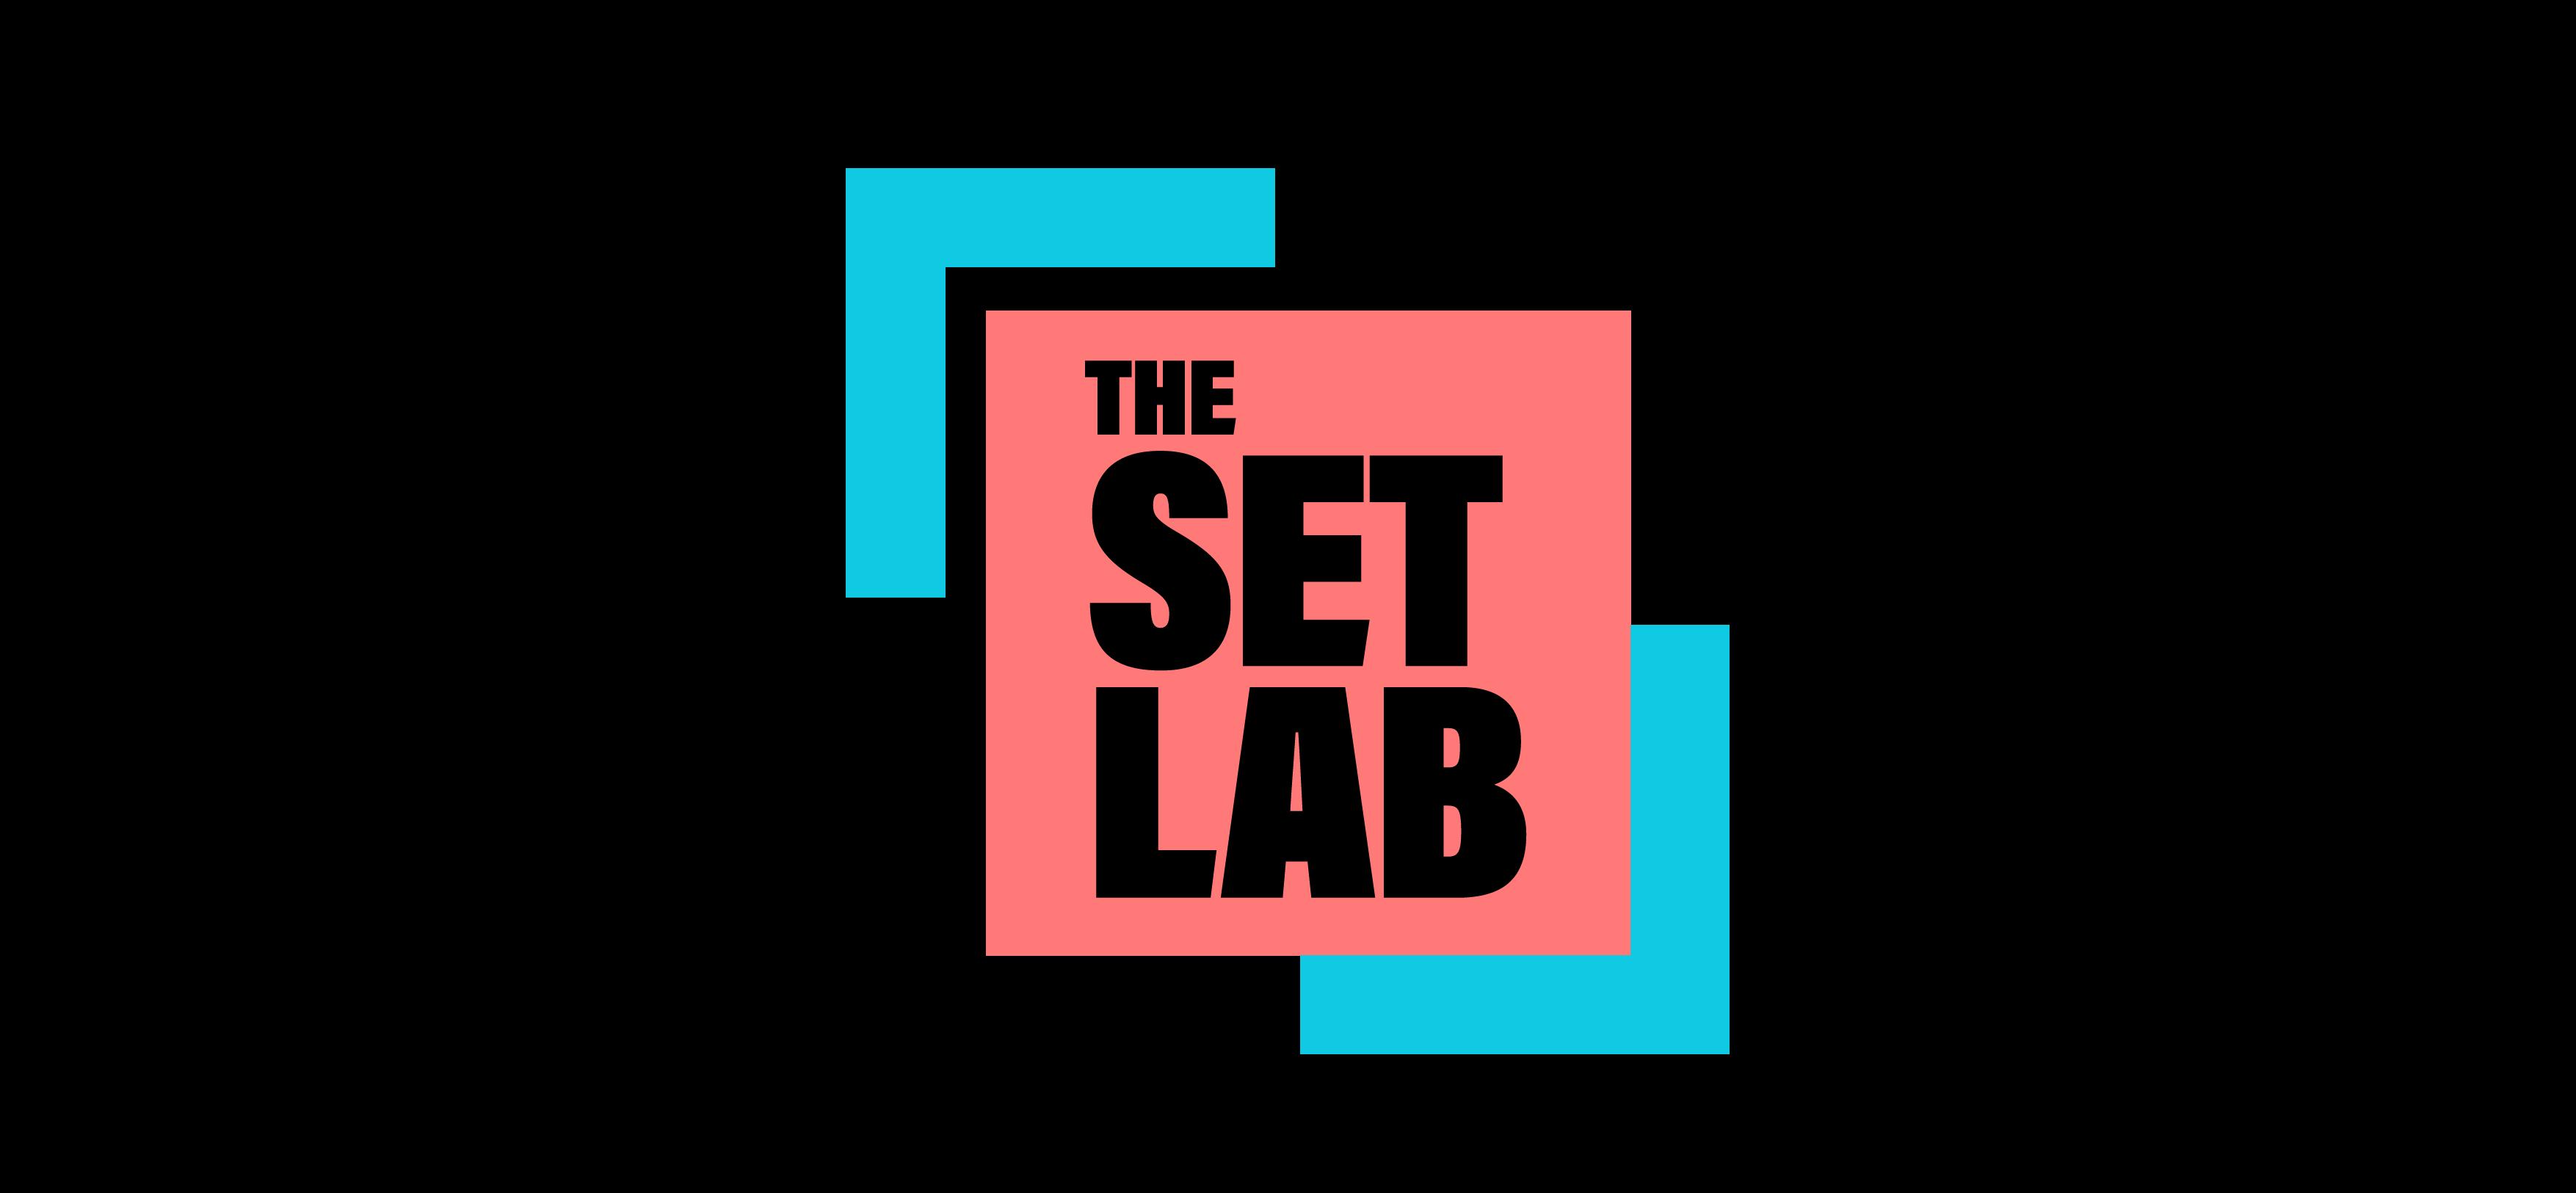 The Set Lab